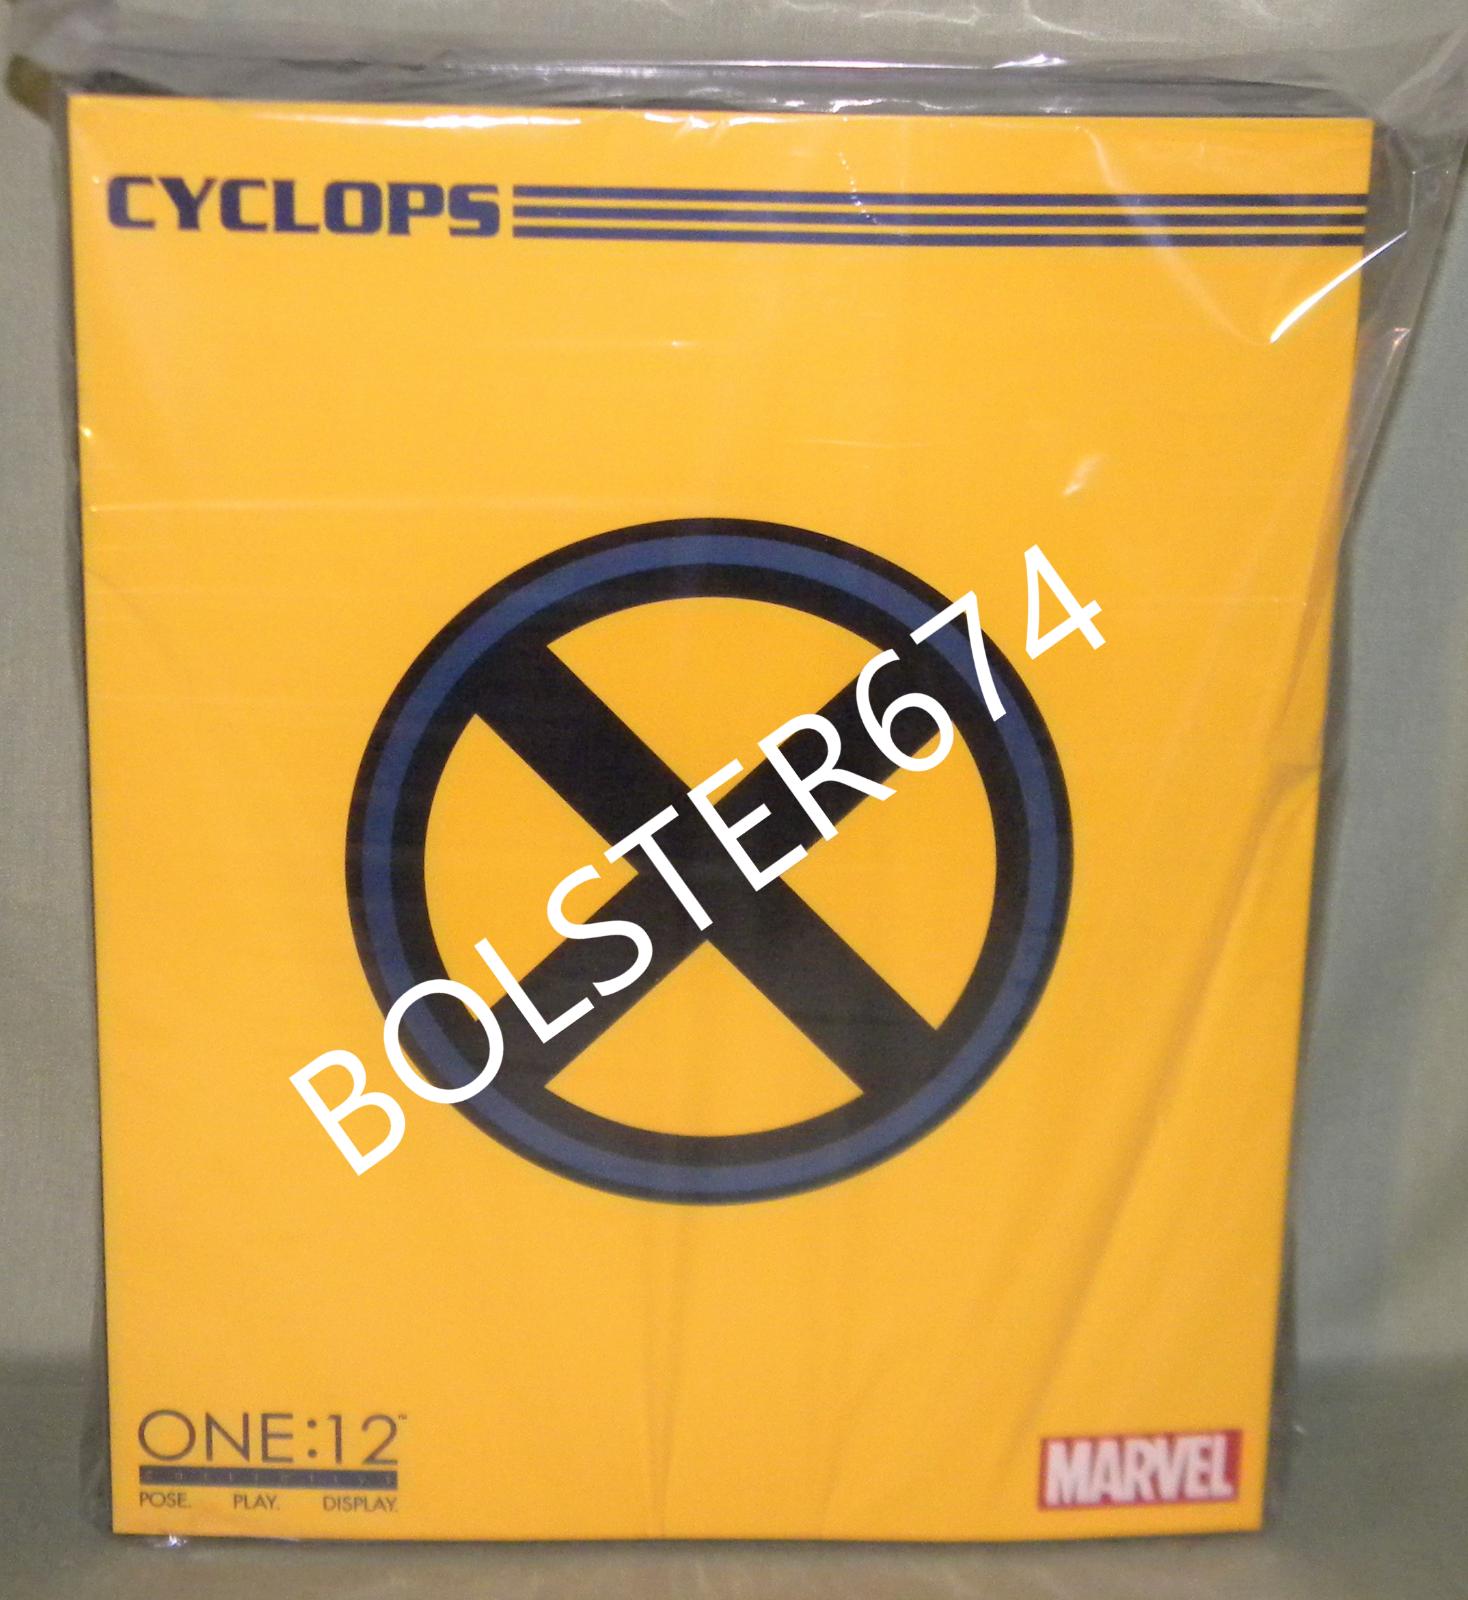 CYCLOPS SCOTT SUMMER One 12 Collective azione cifra MEZCO giocattoloZ Marvel Xessi